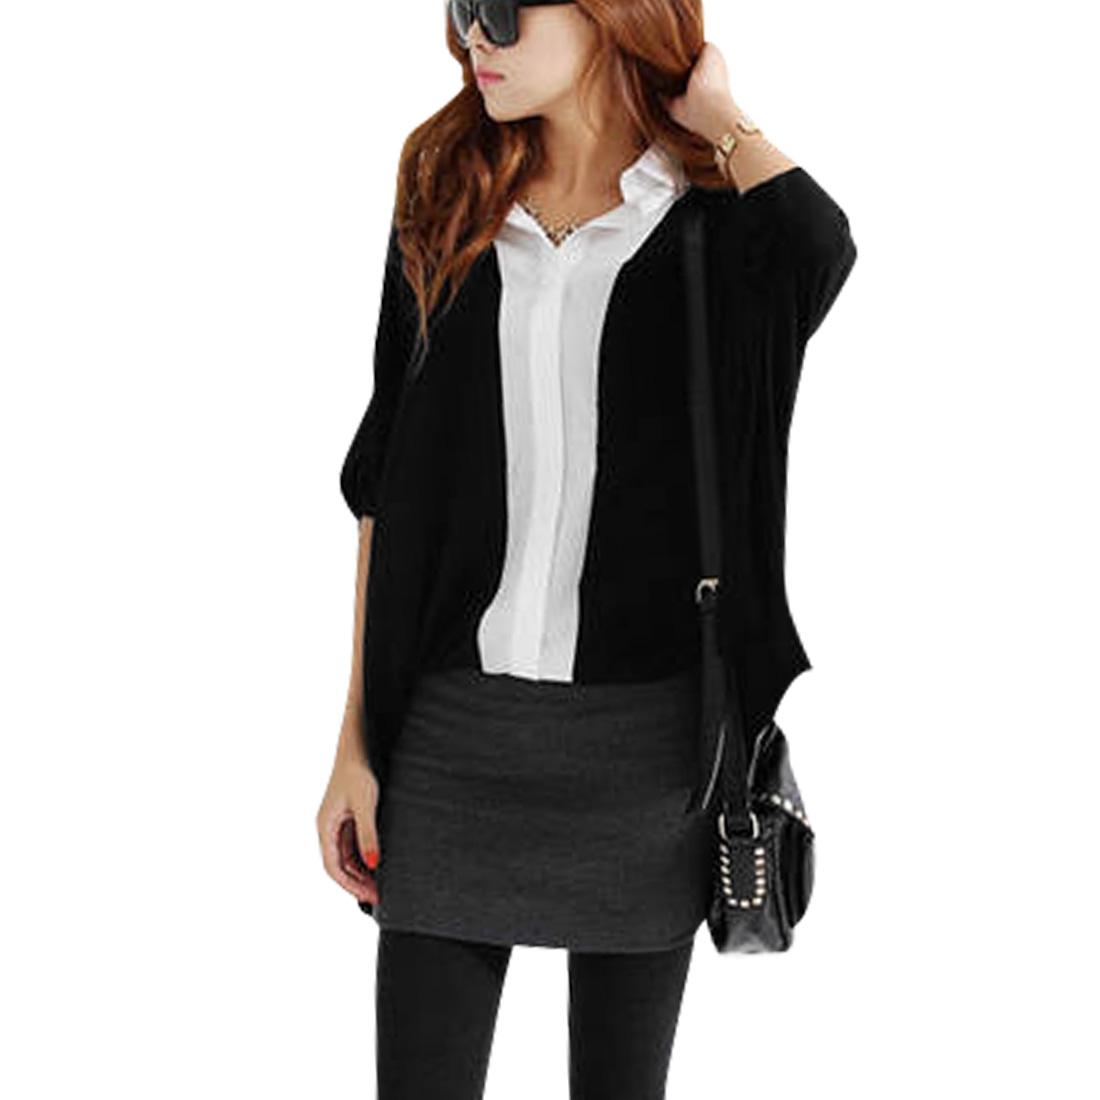 Woman's Point Collar Batwing Sleeves Loose High Low Hem Black Shirt S